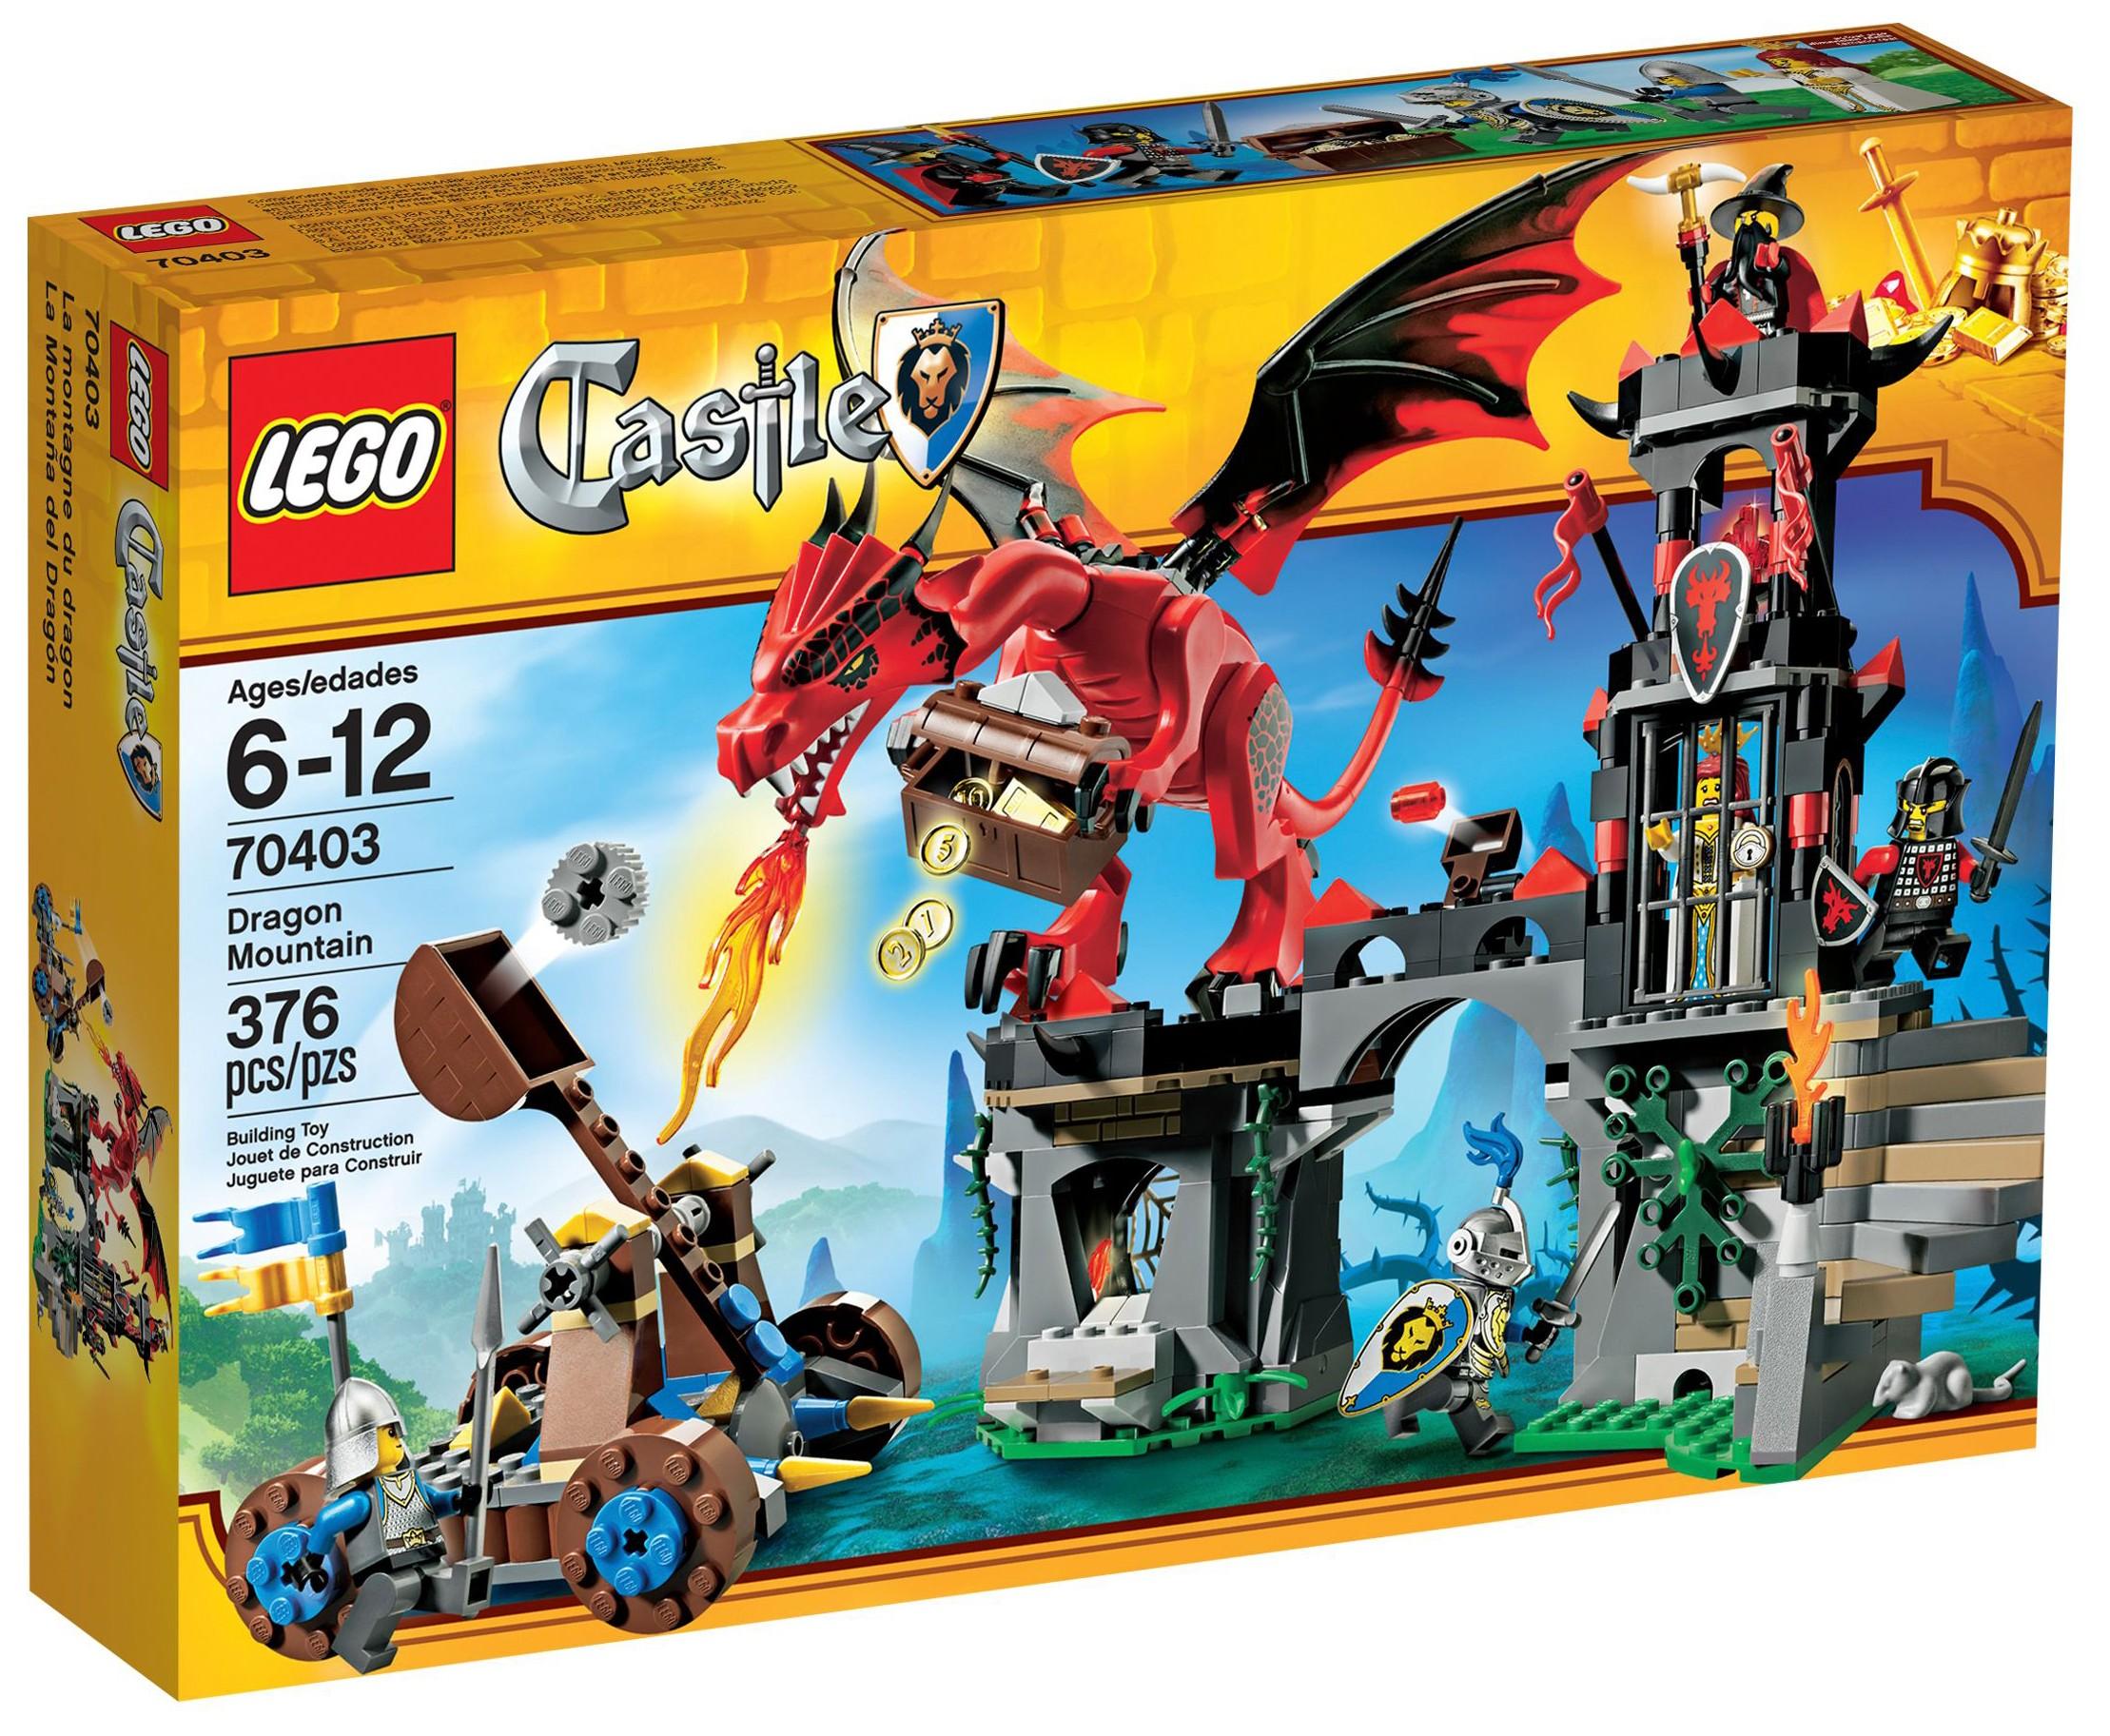 All Lego Toys : June lego store calendar free jor el minifigure promo